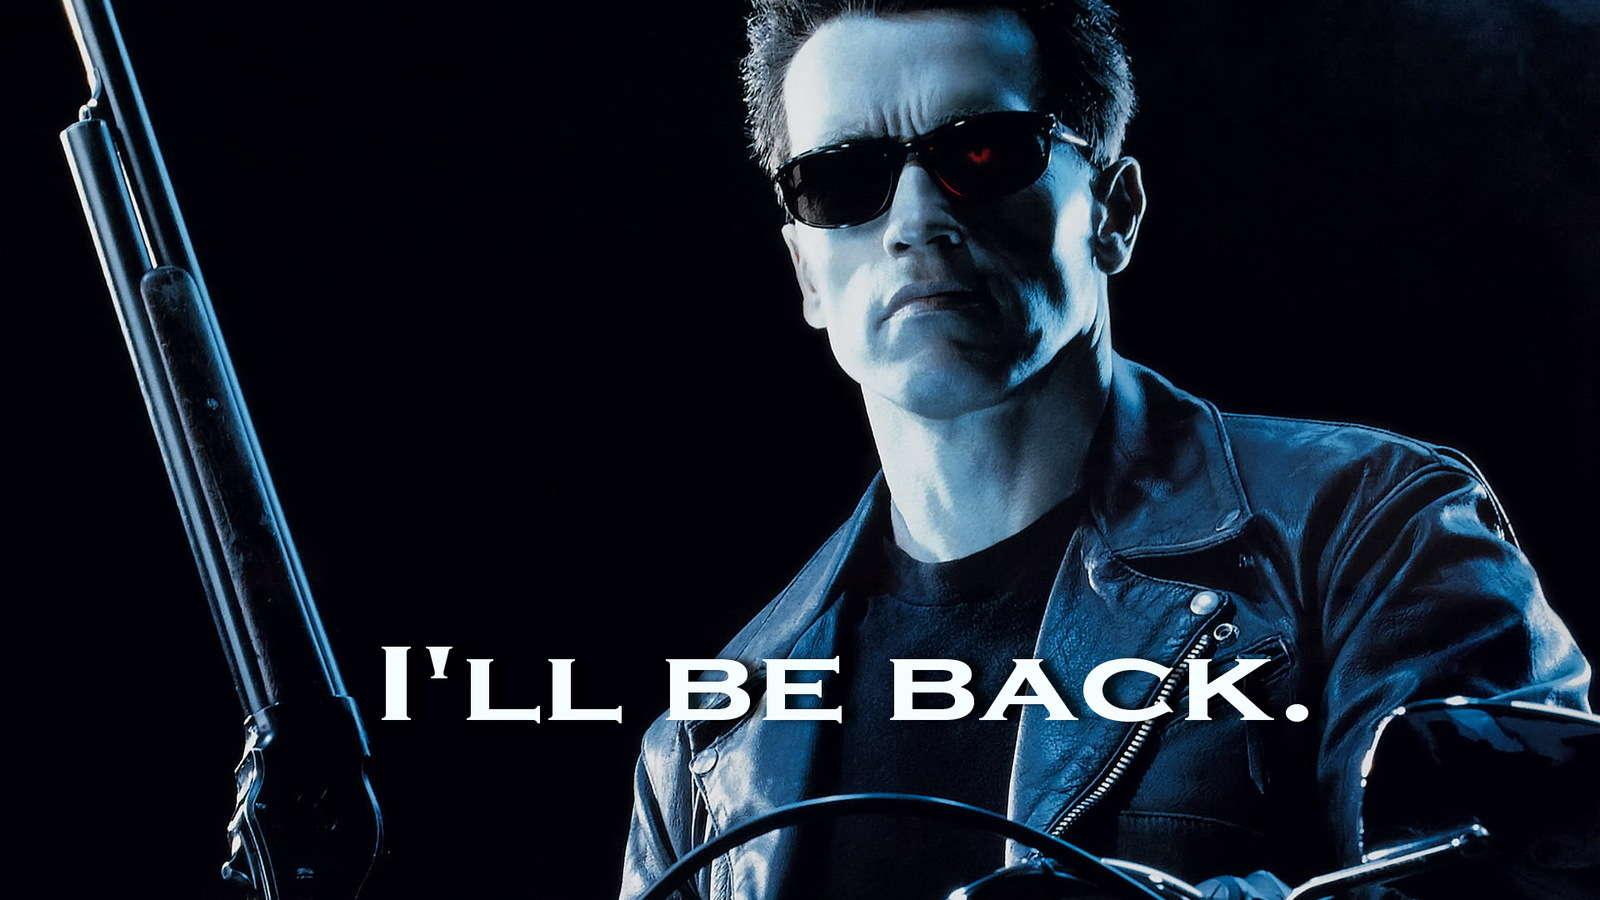 «I' m back» είπε ο «Εξολοθρευτής» Άρντολντ Σβαρτζενέγκερ μετά την έκτακτη επέμβαση ανοικτής καρδιάς που υποβλήθηκε